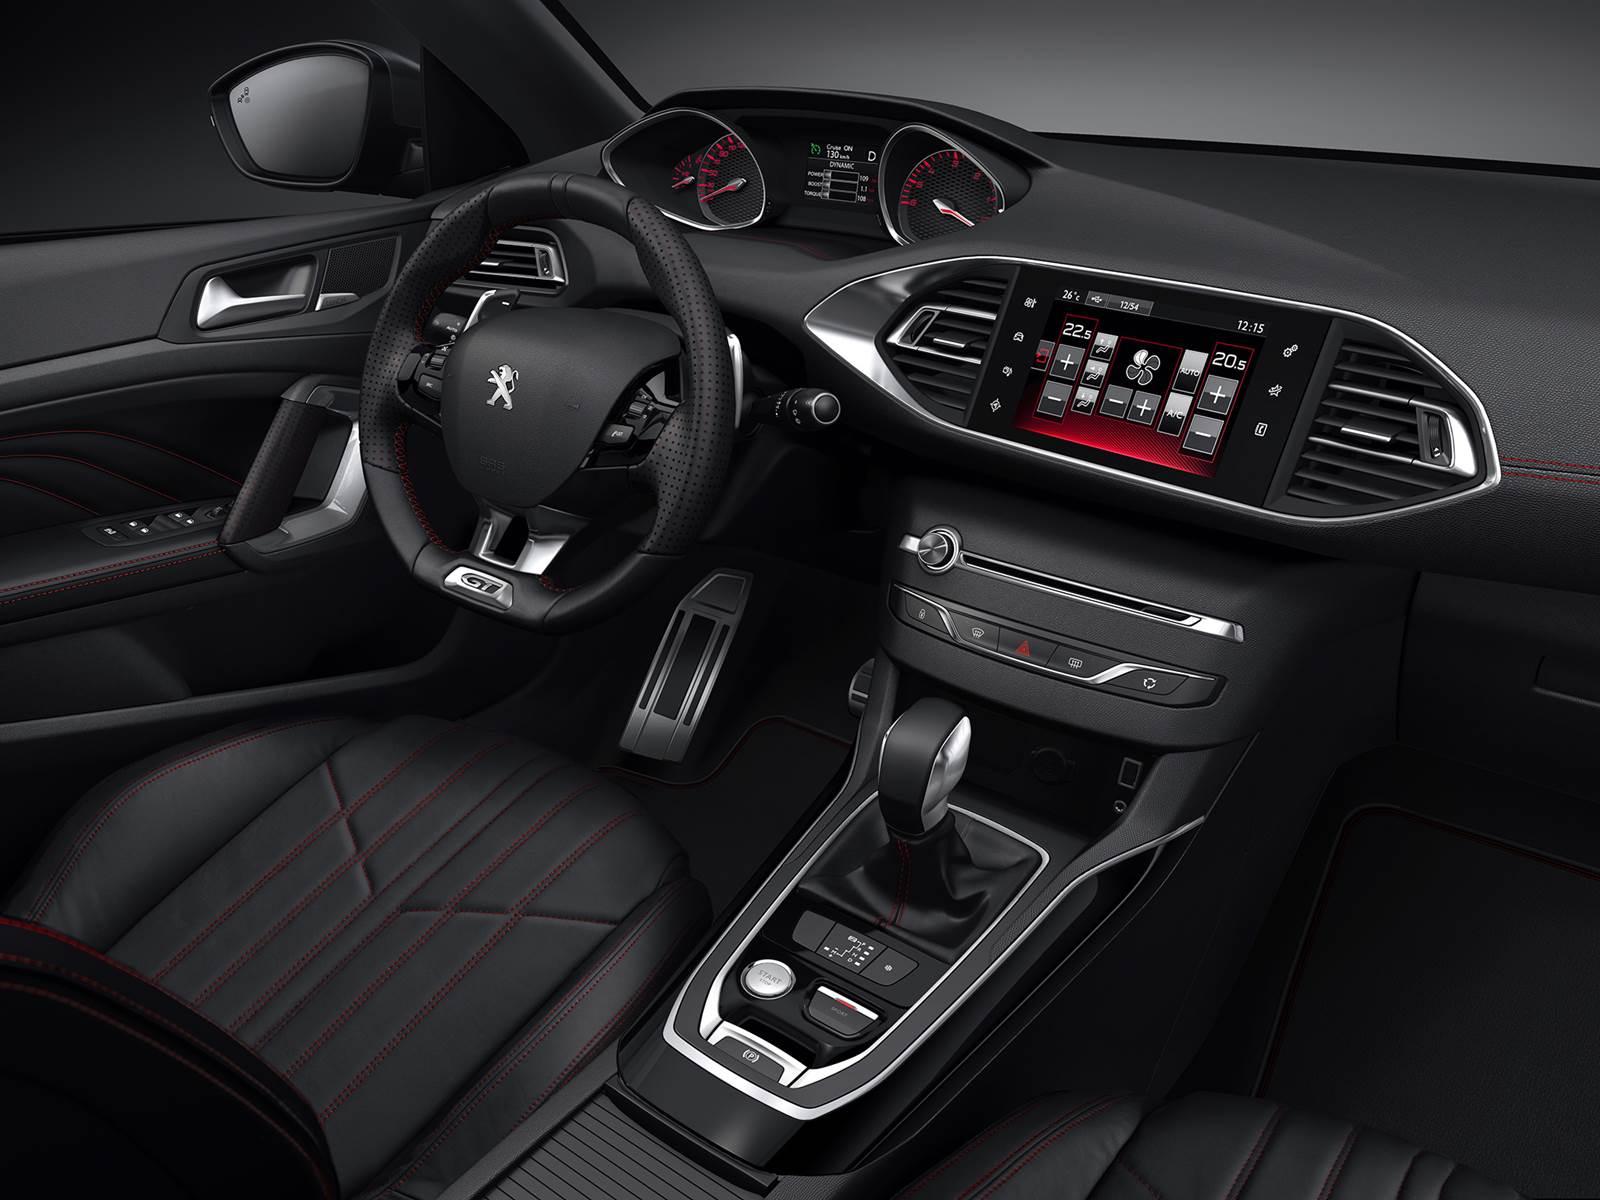 Novo Peugeot 308 GT - interior